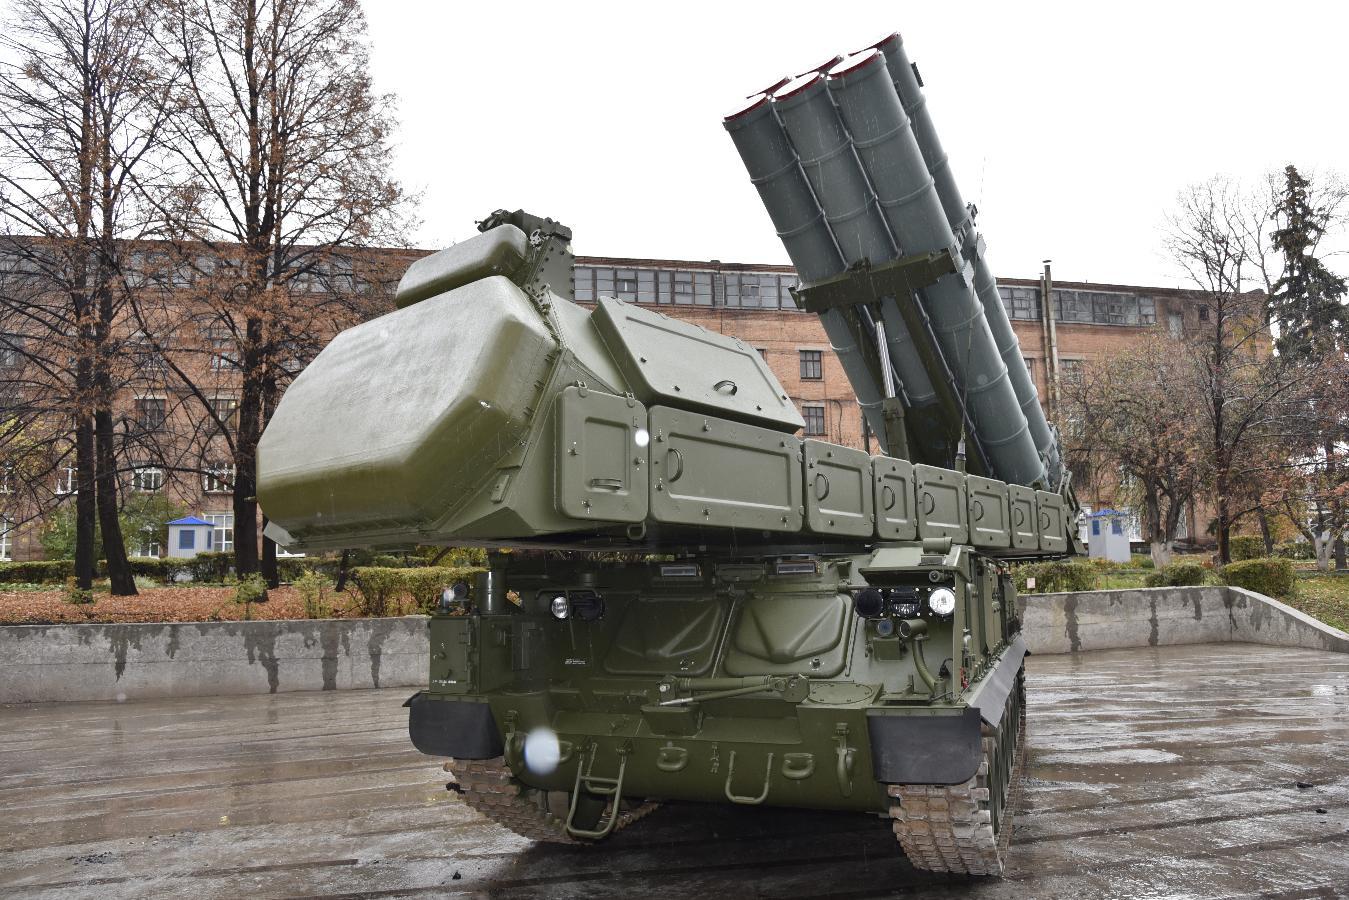 53-я зенитная ракетная бригада в Курске перевооружается на зенитные ракетные комплексы «Бук-М3»